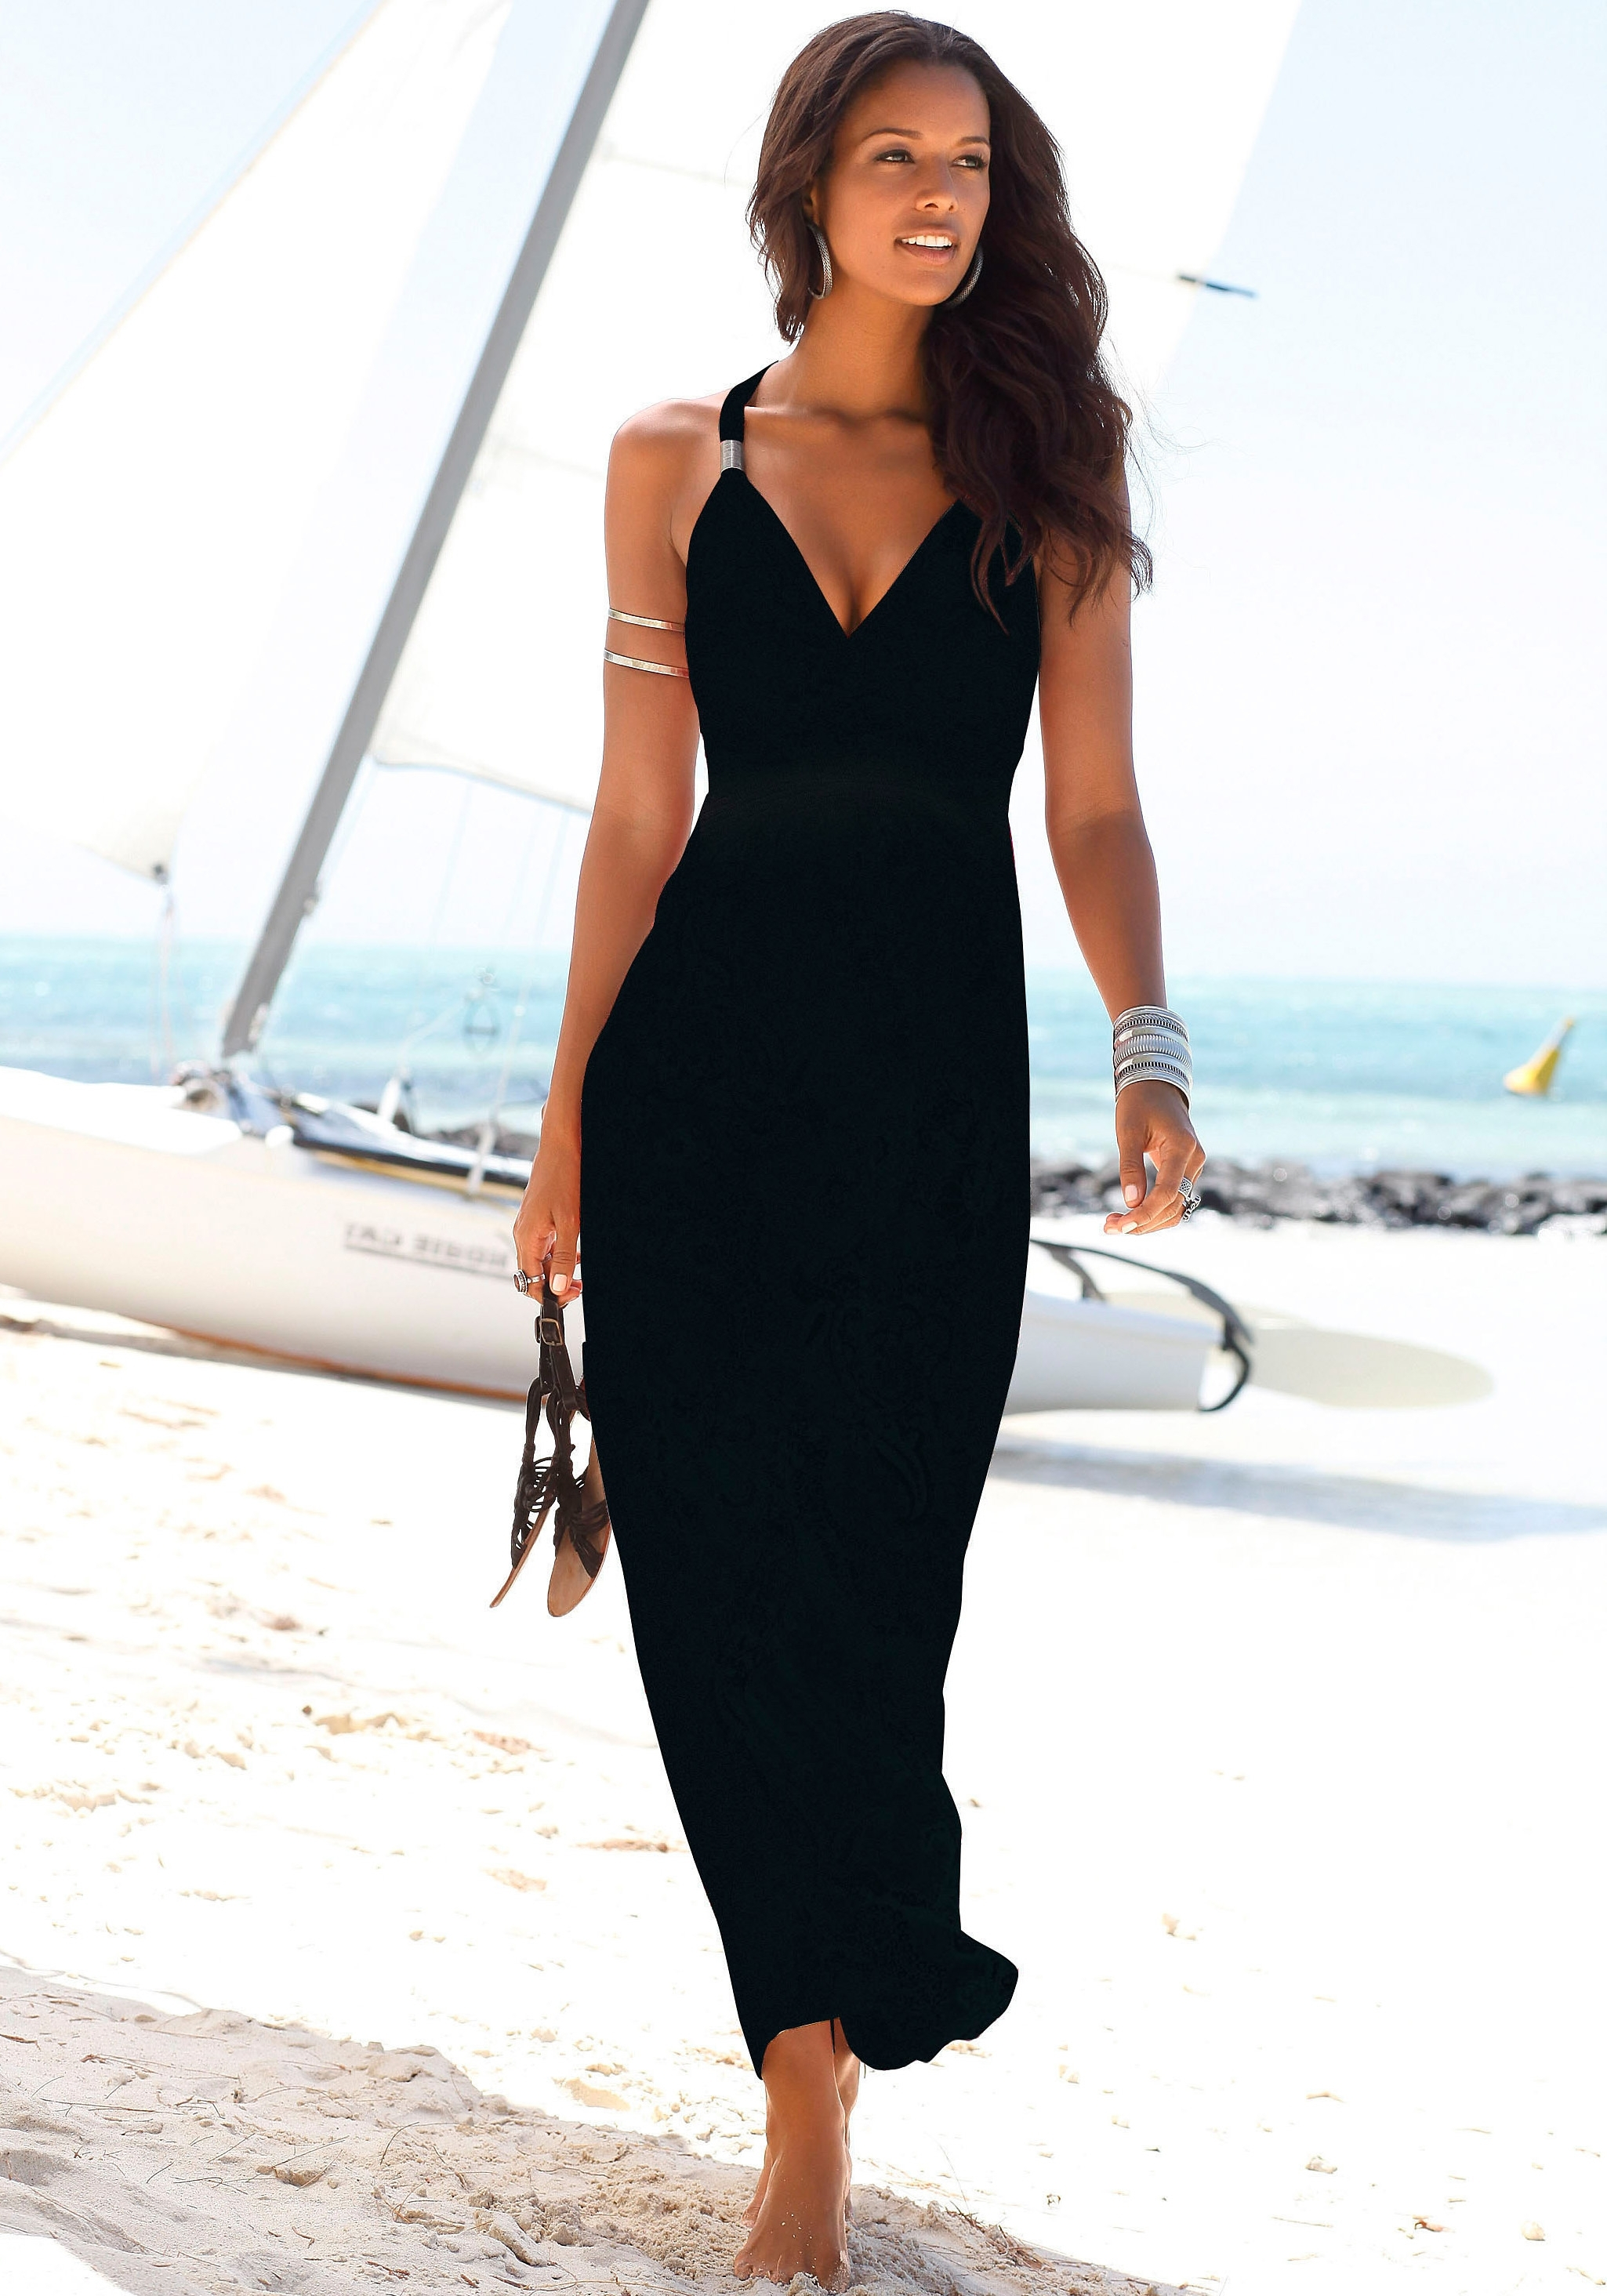 093d17050b74b0 Maxi-jurk online kopen  Ruim 385 trendy en stijlvolle maxi-jurken